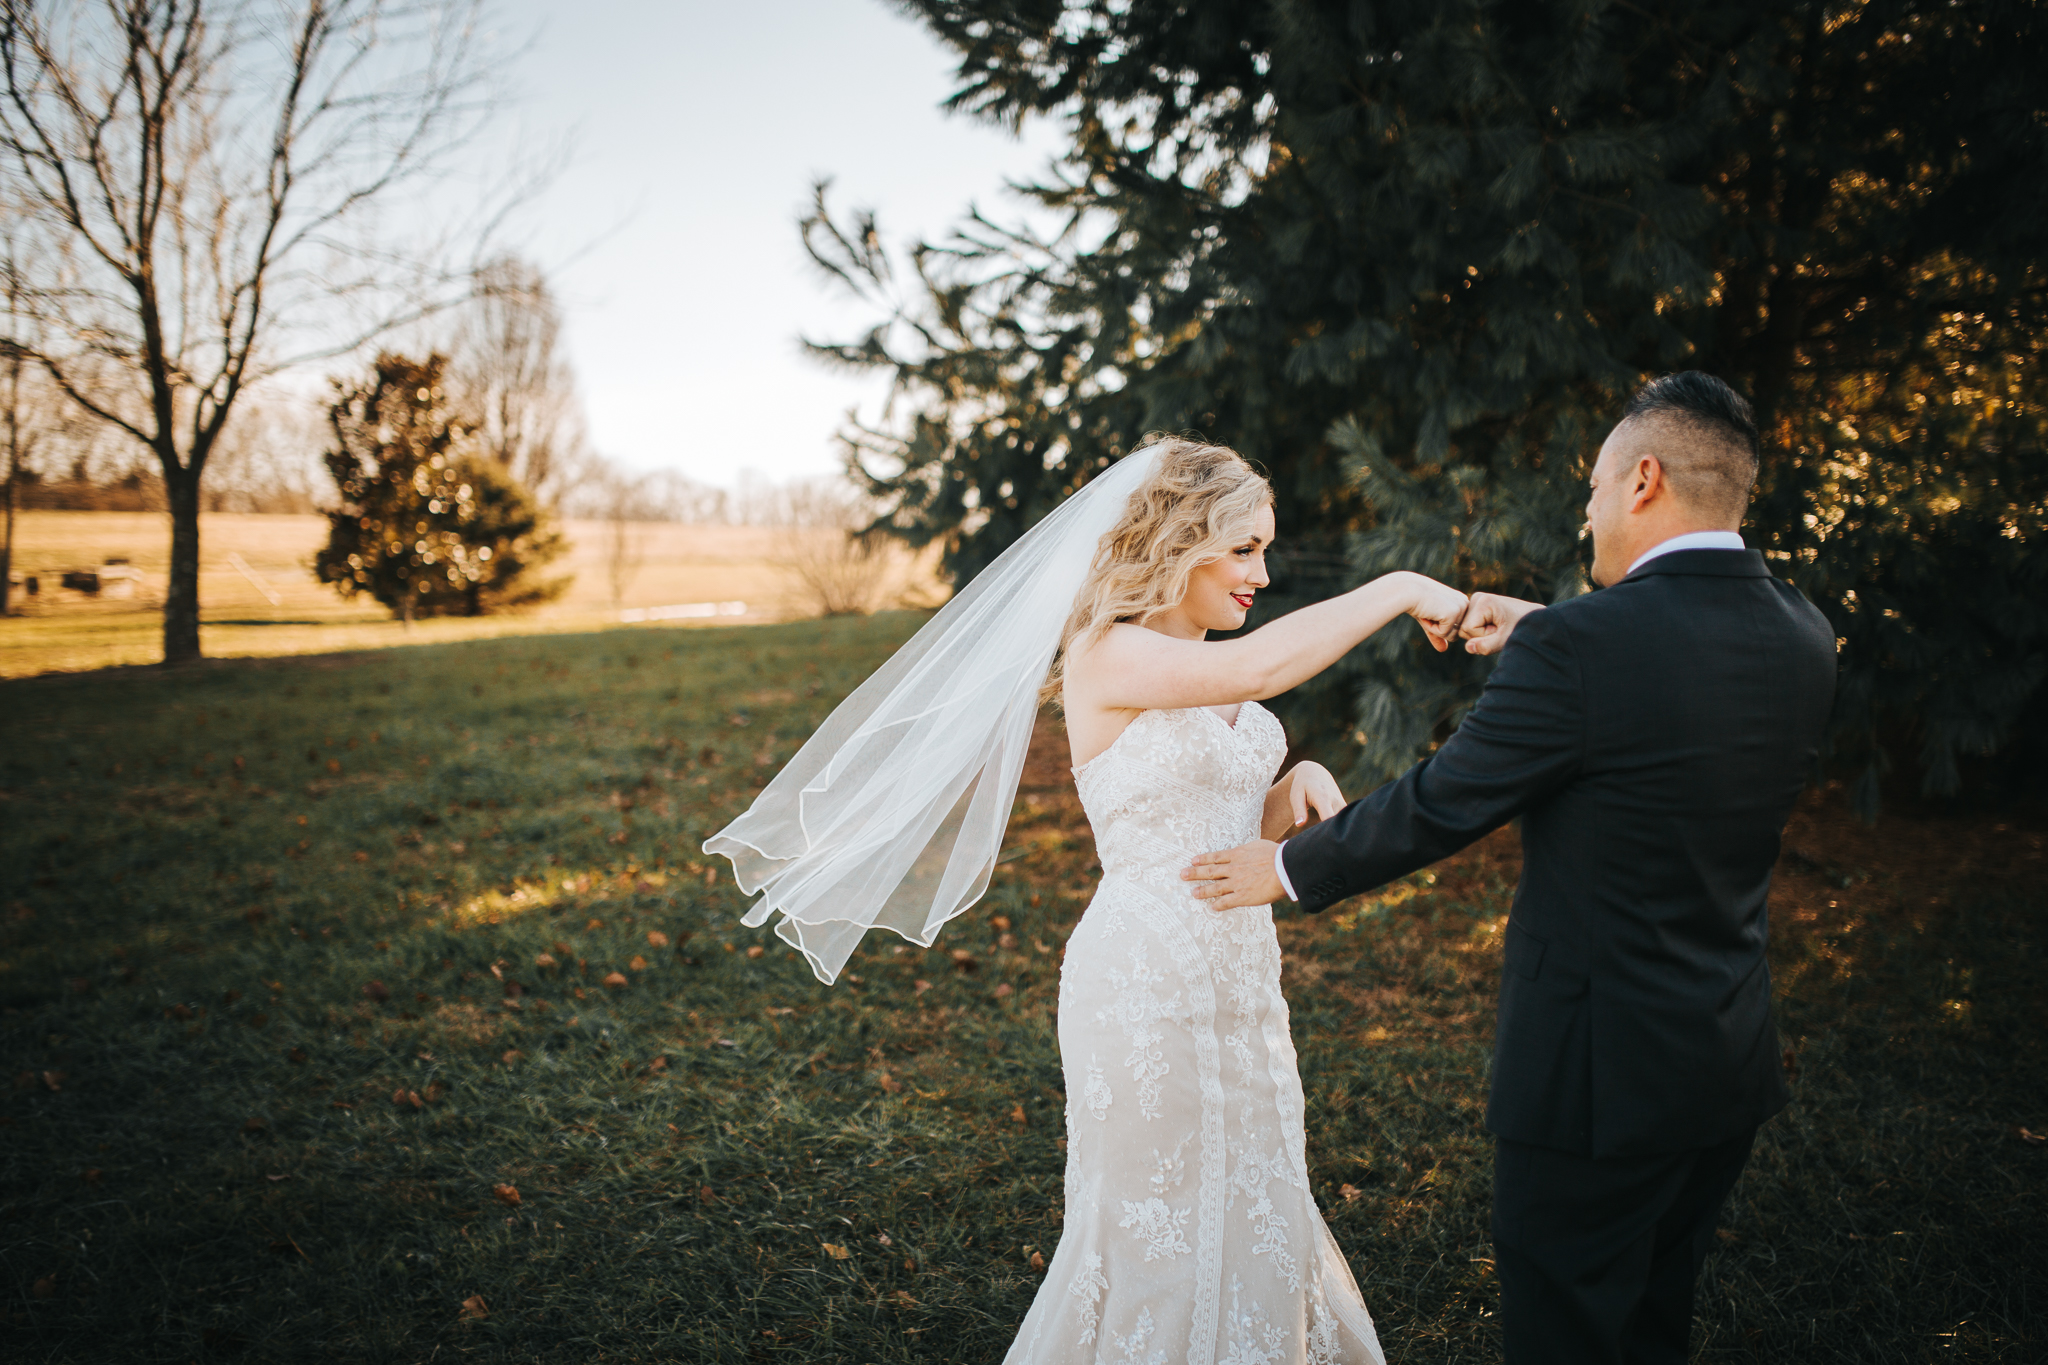 0049 Ariana Jordan Photo - Cameron & Lauren's Wedding at Talon Winery  6171.jpg